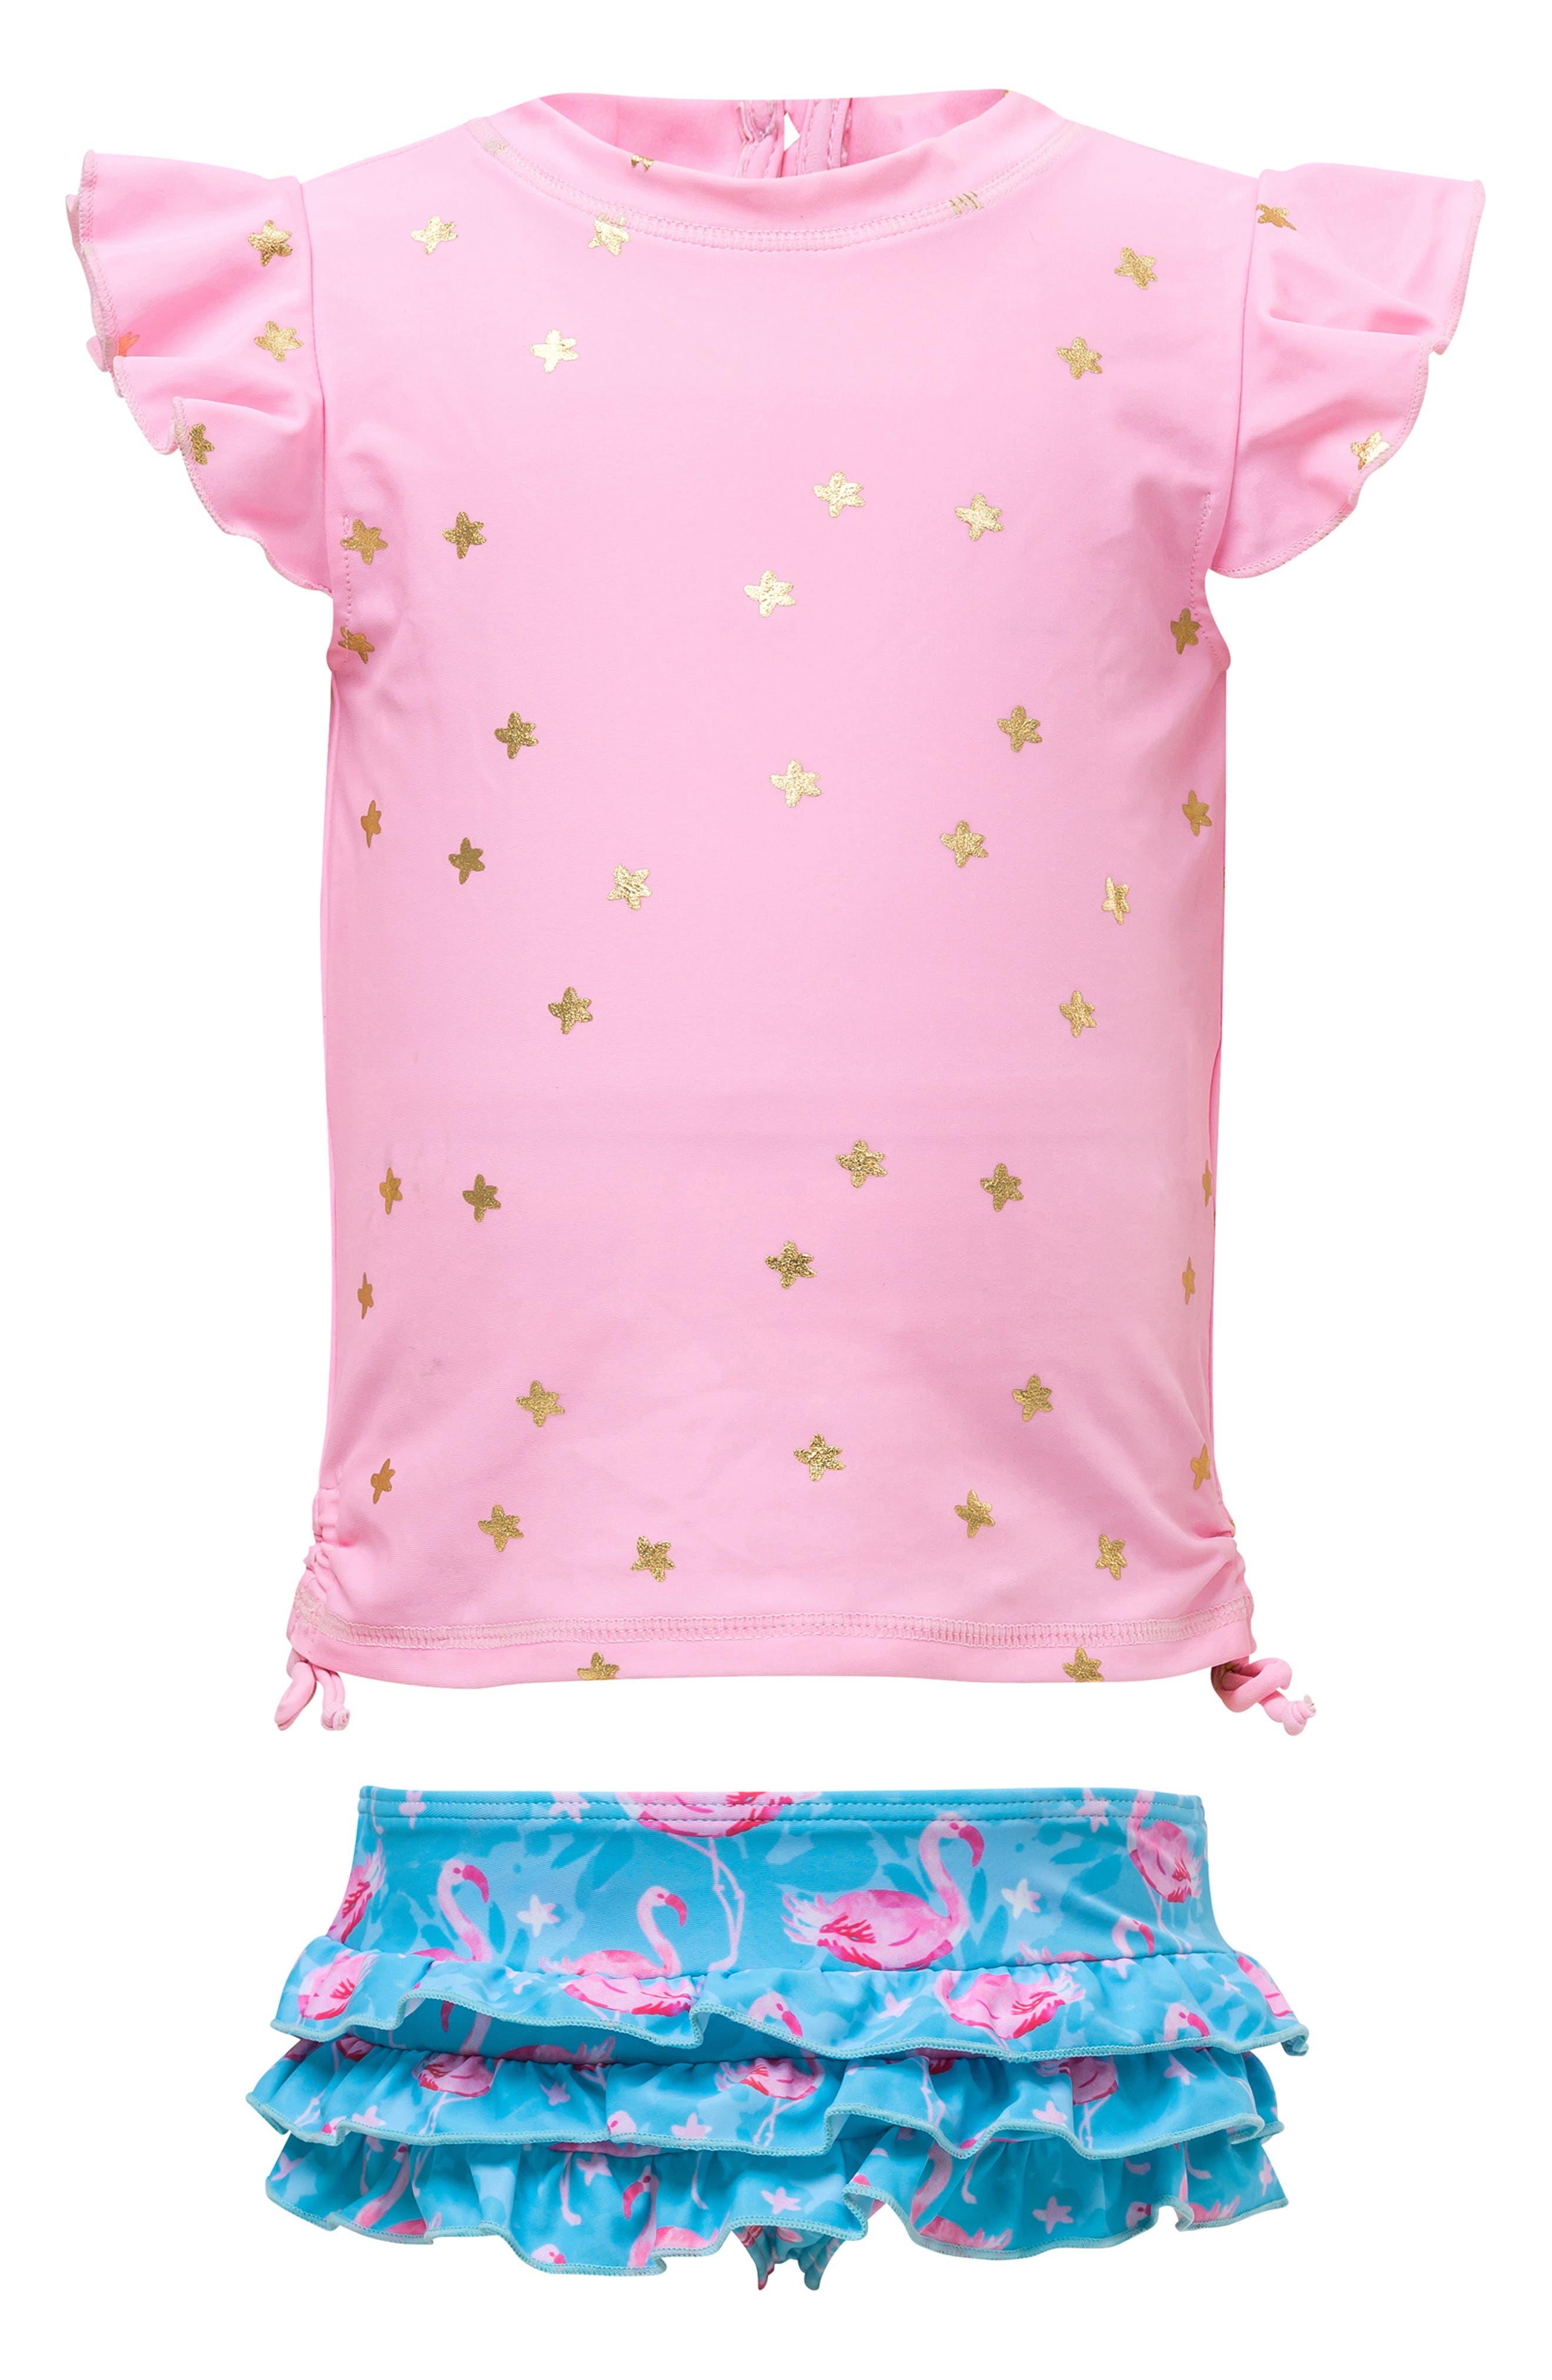 Girls' Clothing (newborn-5t) Ambitious Joe Boxer Toddler Baby Girl One Piece Swimsuit Swim Floral Purple Sz 12m